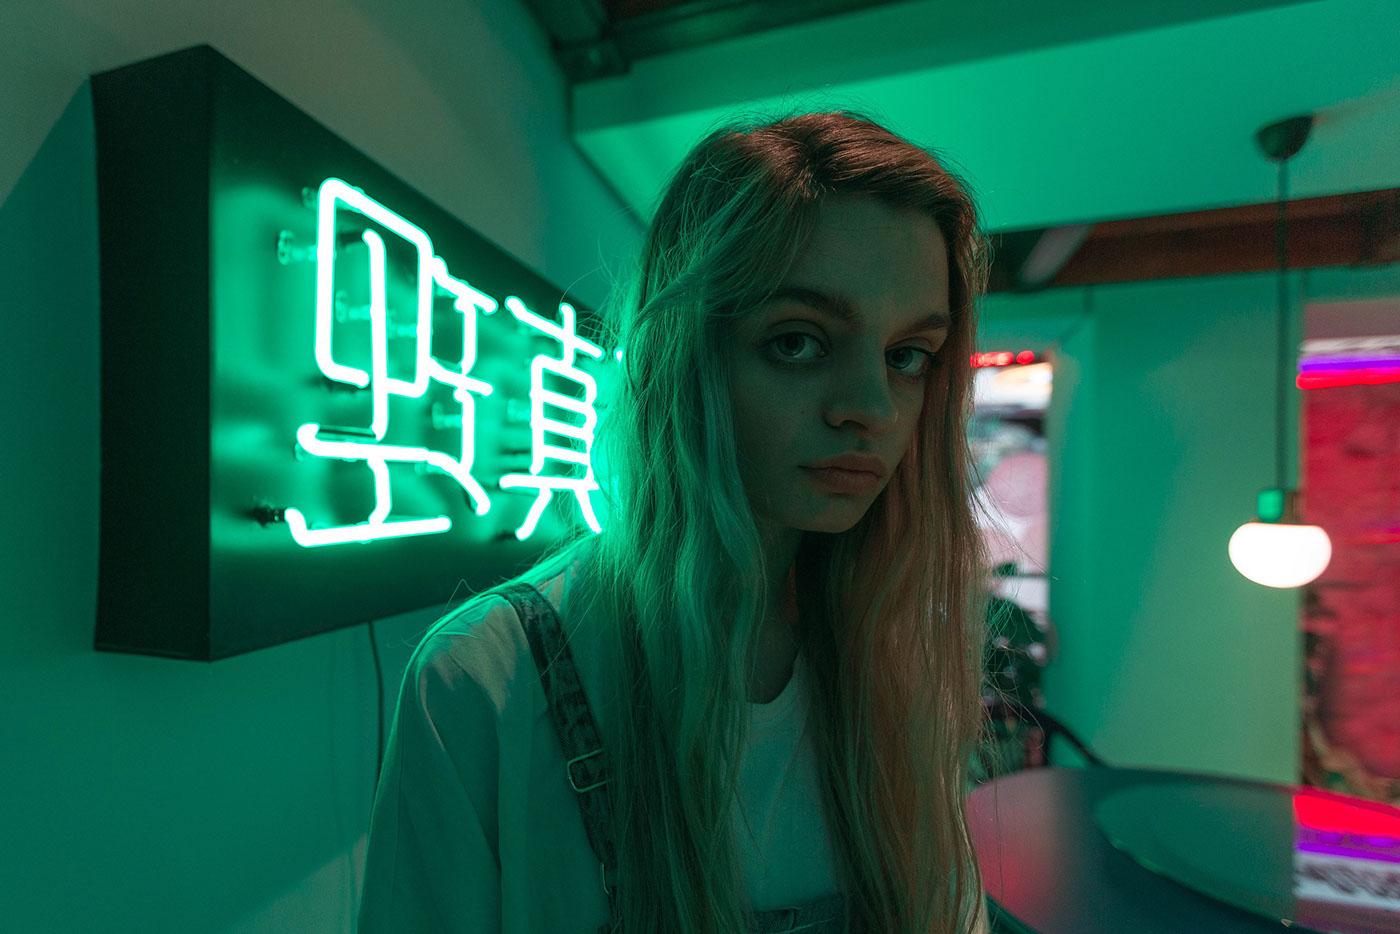 Lookbook music neon youth